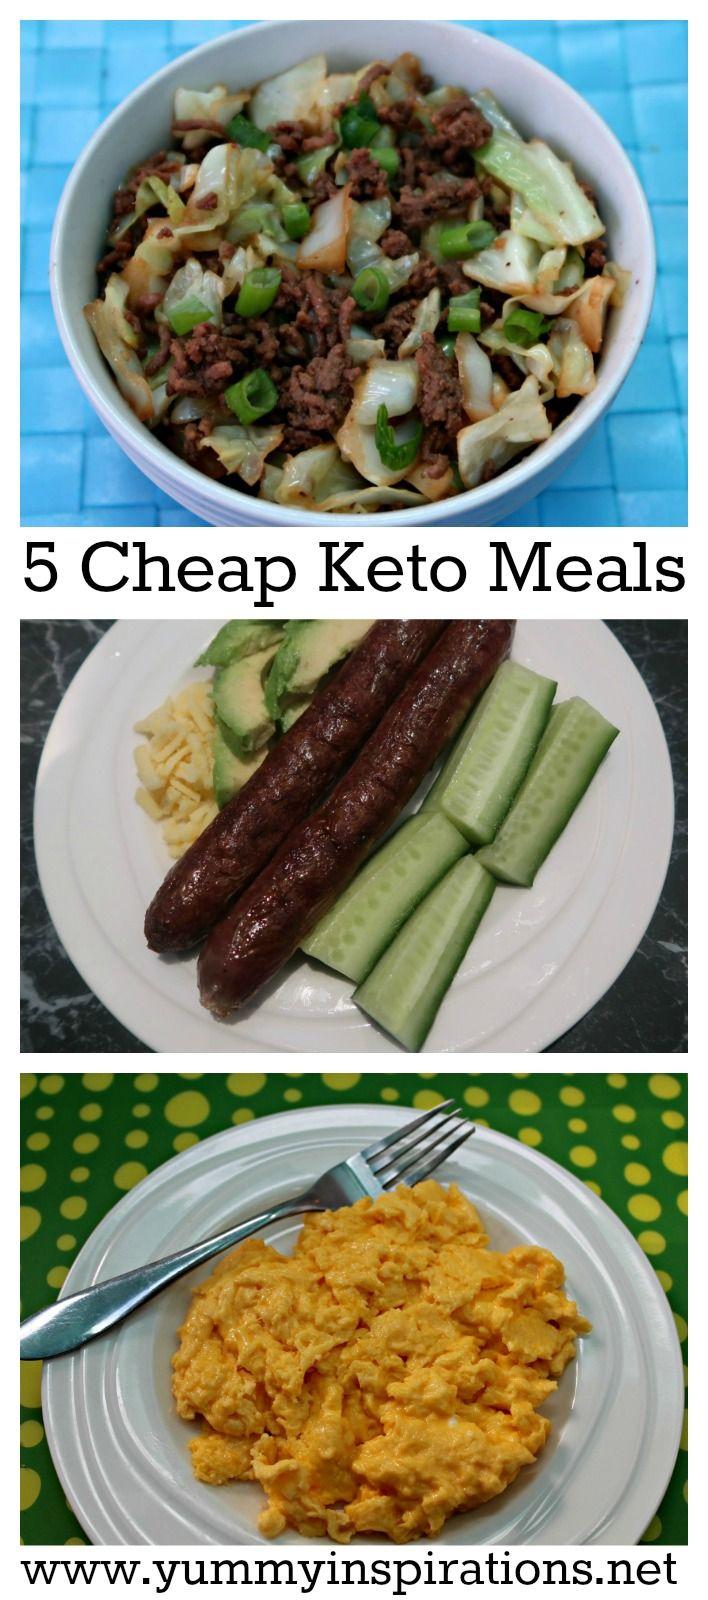 5 cheap keto meals budget keto diet foods recipes for dinners 5 cheap keto meals budget keto diet foods recipes for dinners and meals forumfinder Gallery